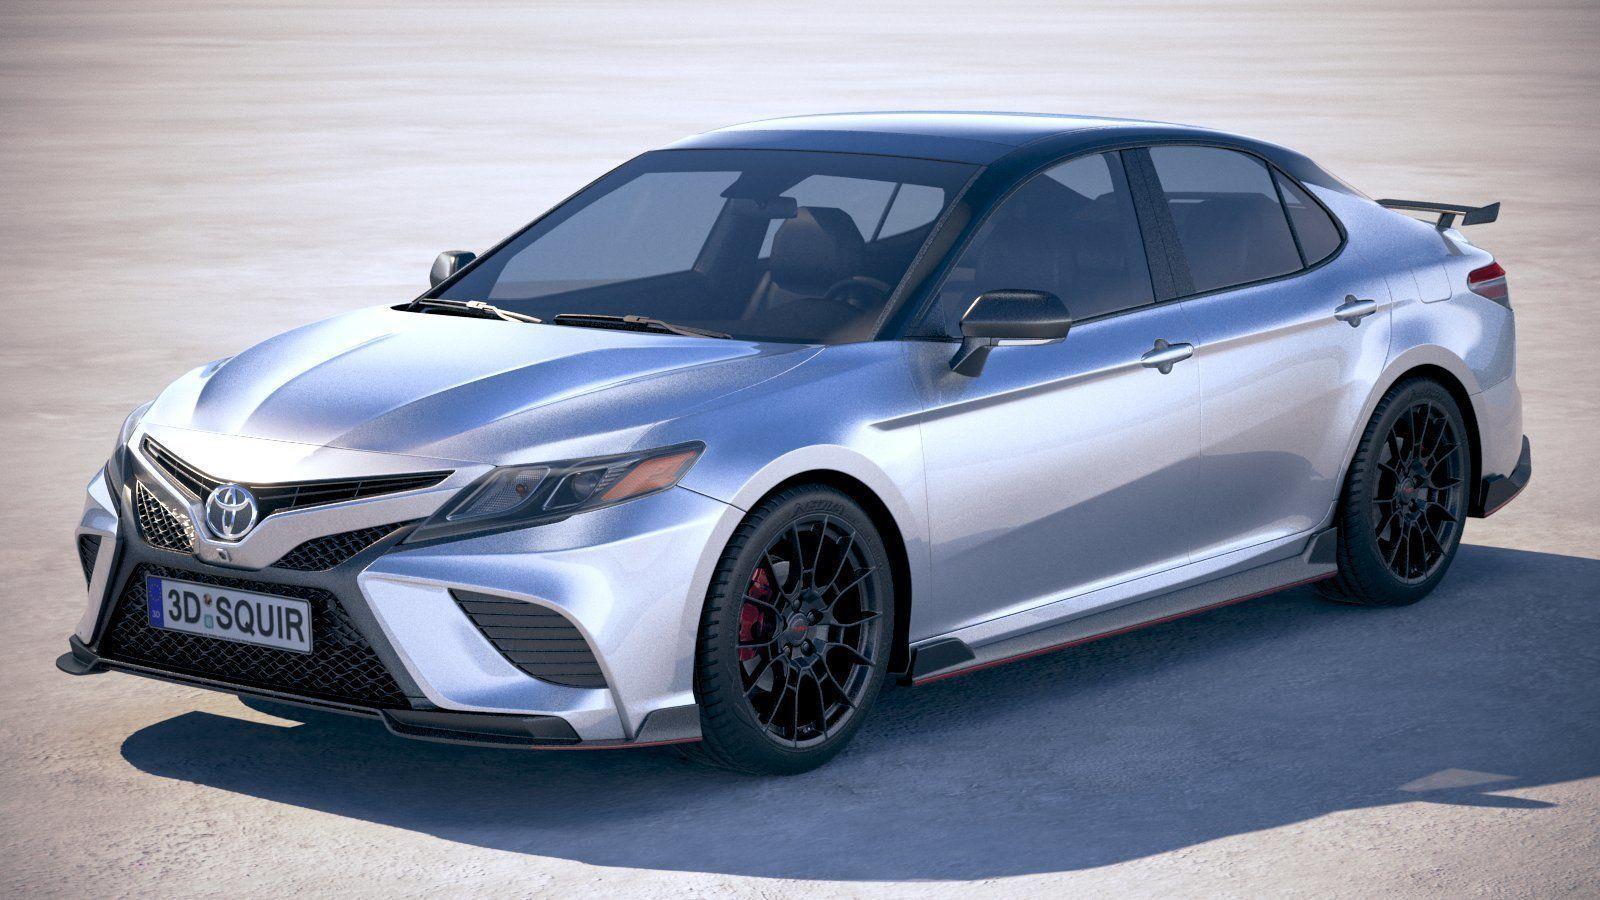 3d Toyota Camry Trd 2020 V6 Cgtrader